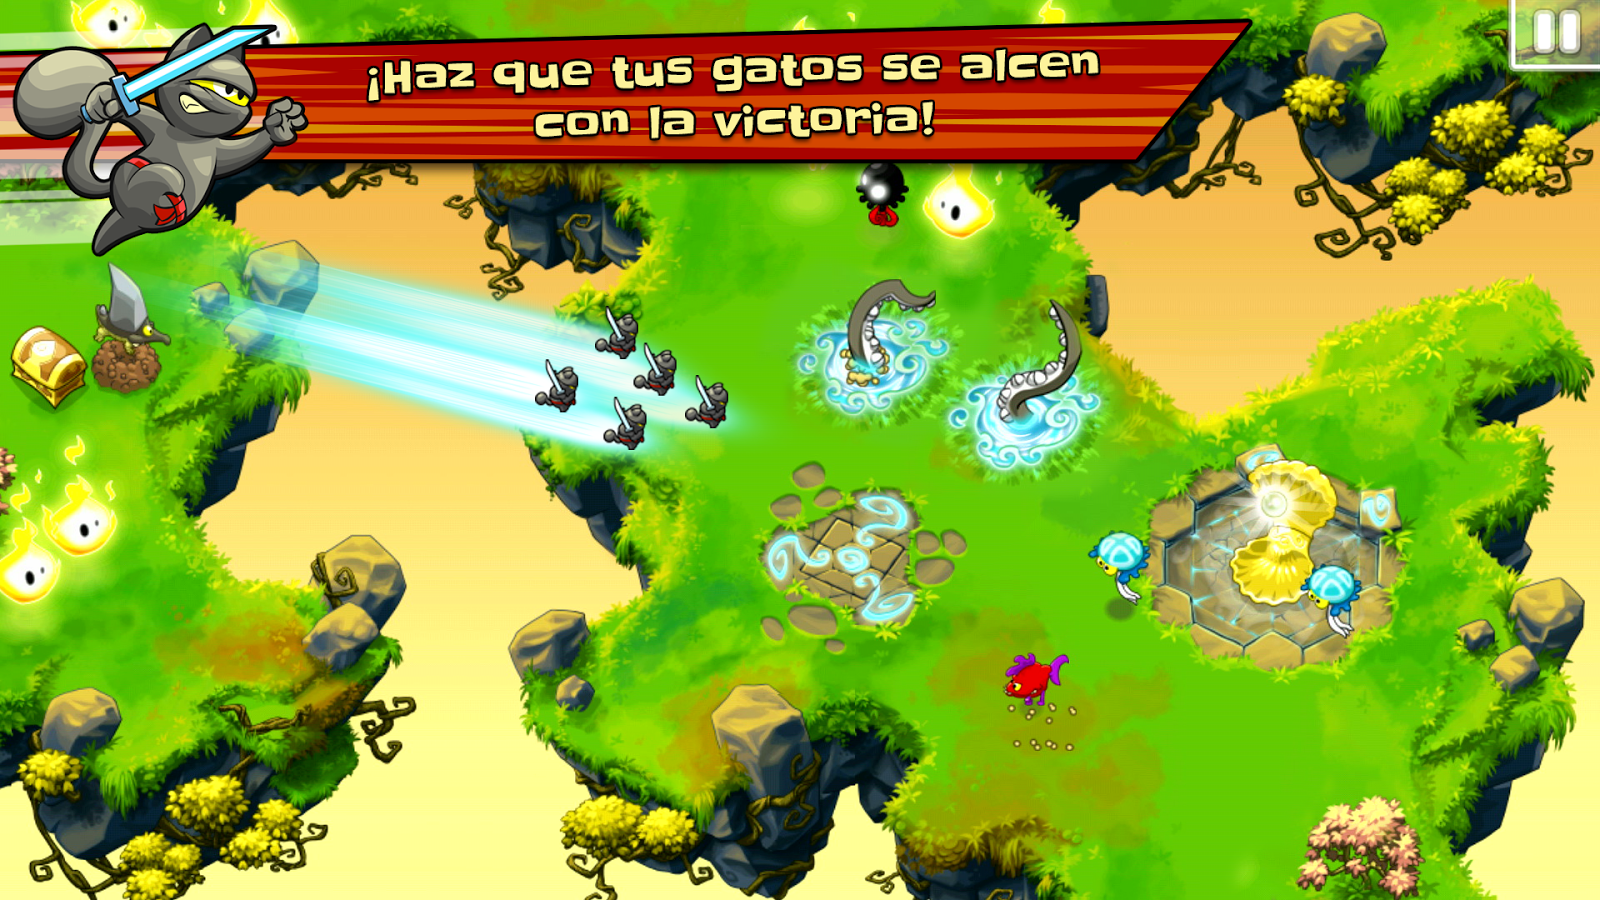 Ninja Hero Cats v1.0.2 [Modificado] [APK] [Android] [Zippyshare] YqsC-tDIy31I9CacUqcPPc2oFS1vRNUUz0ez_KhraUu2aV3Q6xAlW8lWQWCFf6LShA=h900